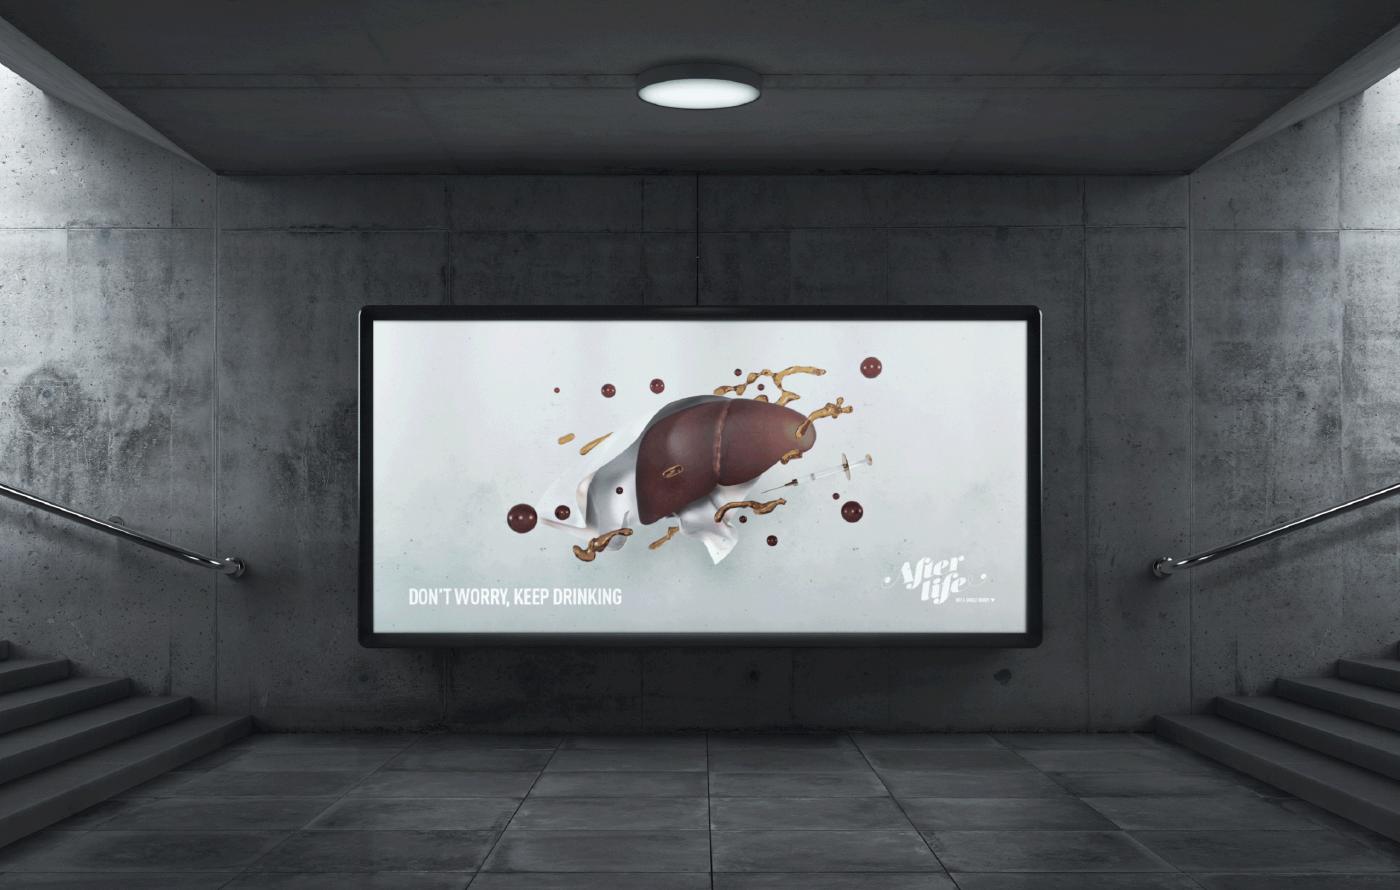 afterlife mockup metro subway mupi advertising